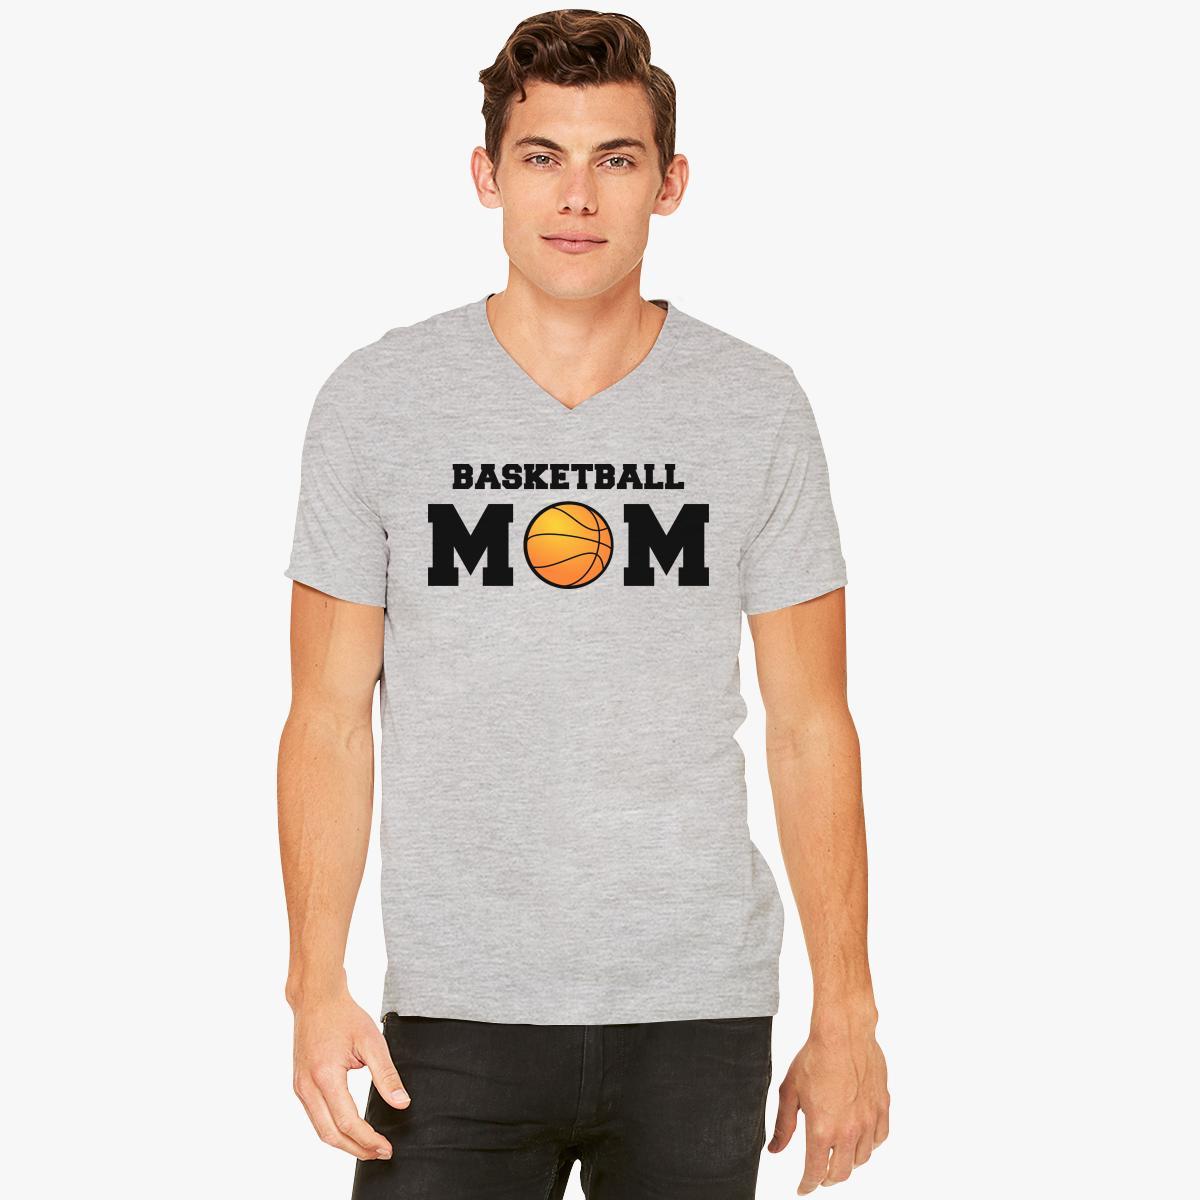 3368d0d5 Basketball Mom Tee Shirts